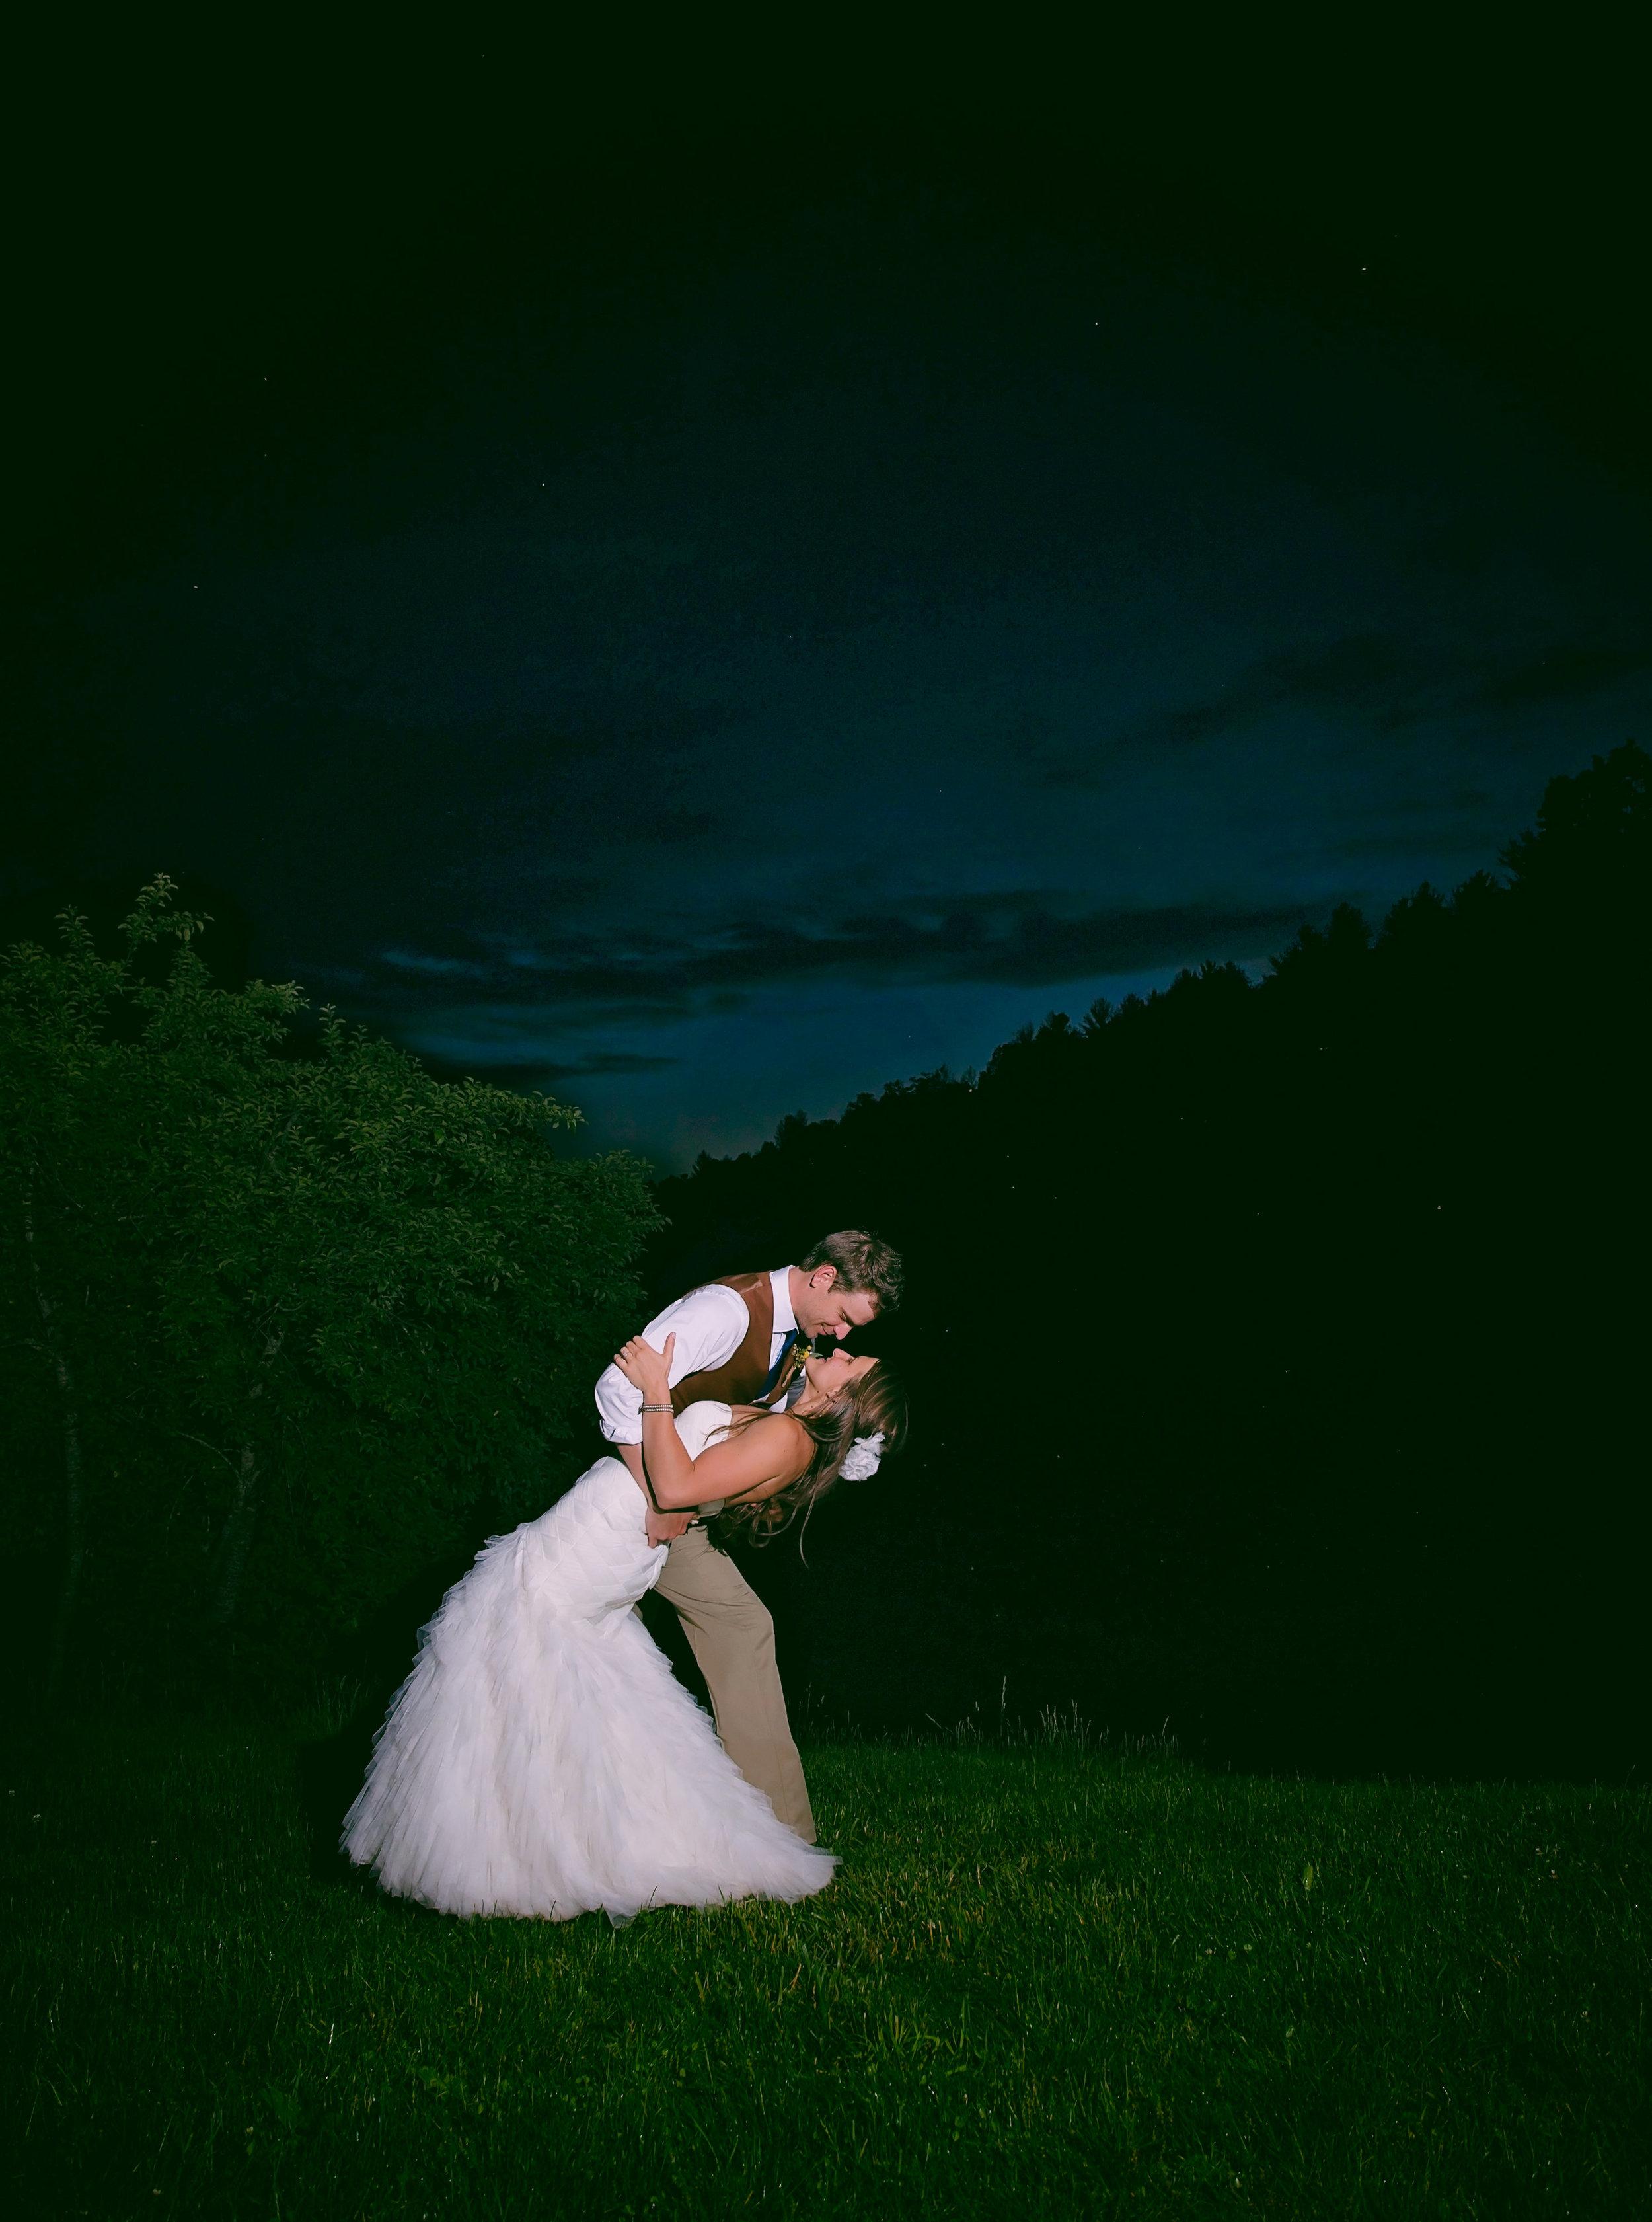 #boonenc #ido #northcarolinawedding #ocf #weddingportraits #lightingiskey